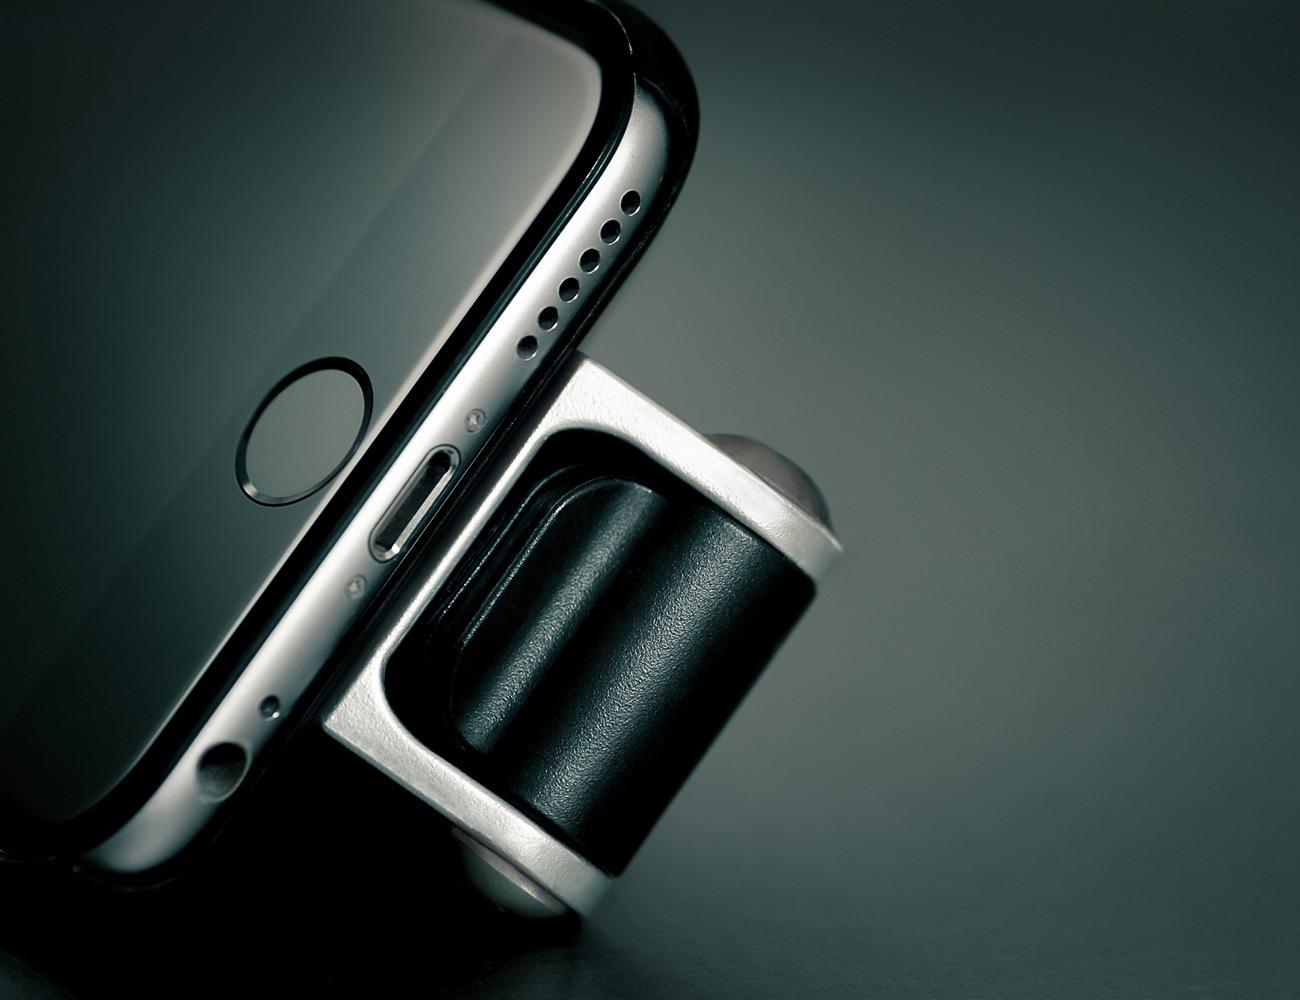 flip-it-iphone-selfie-case-01